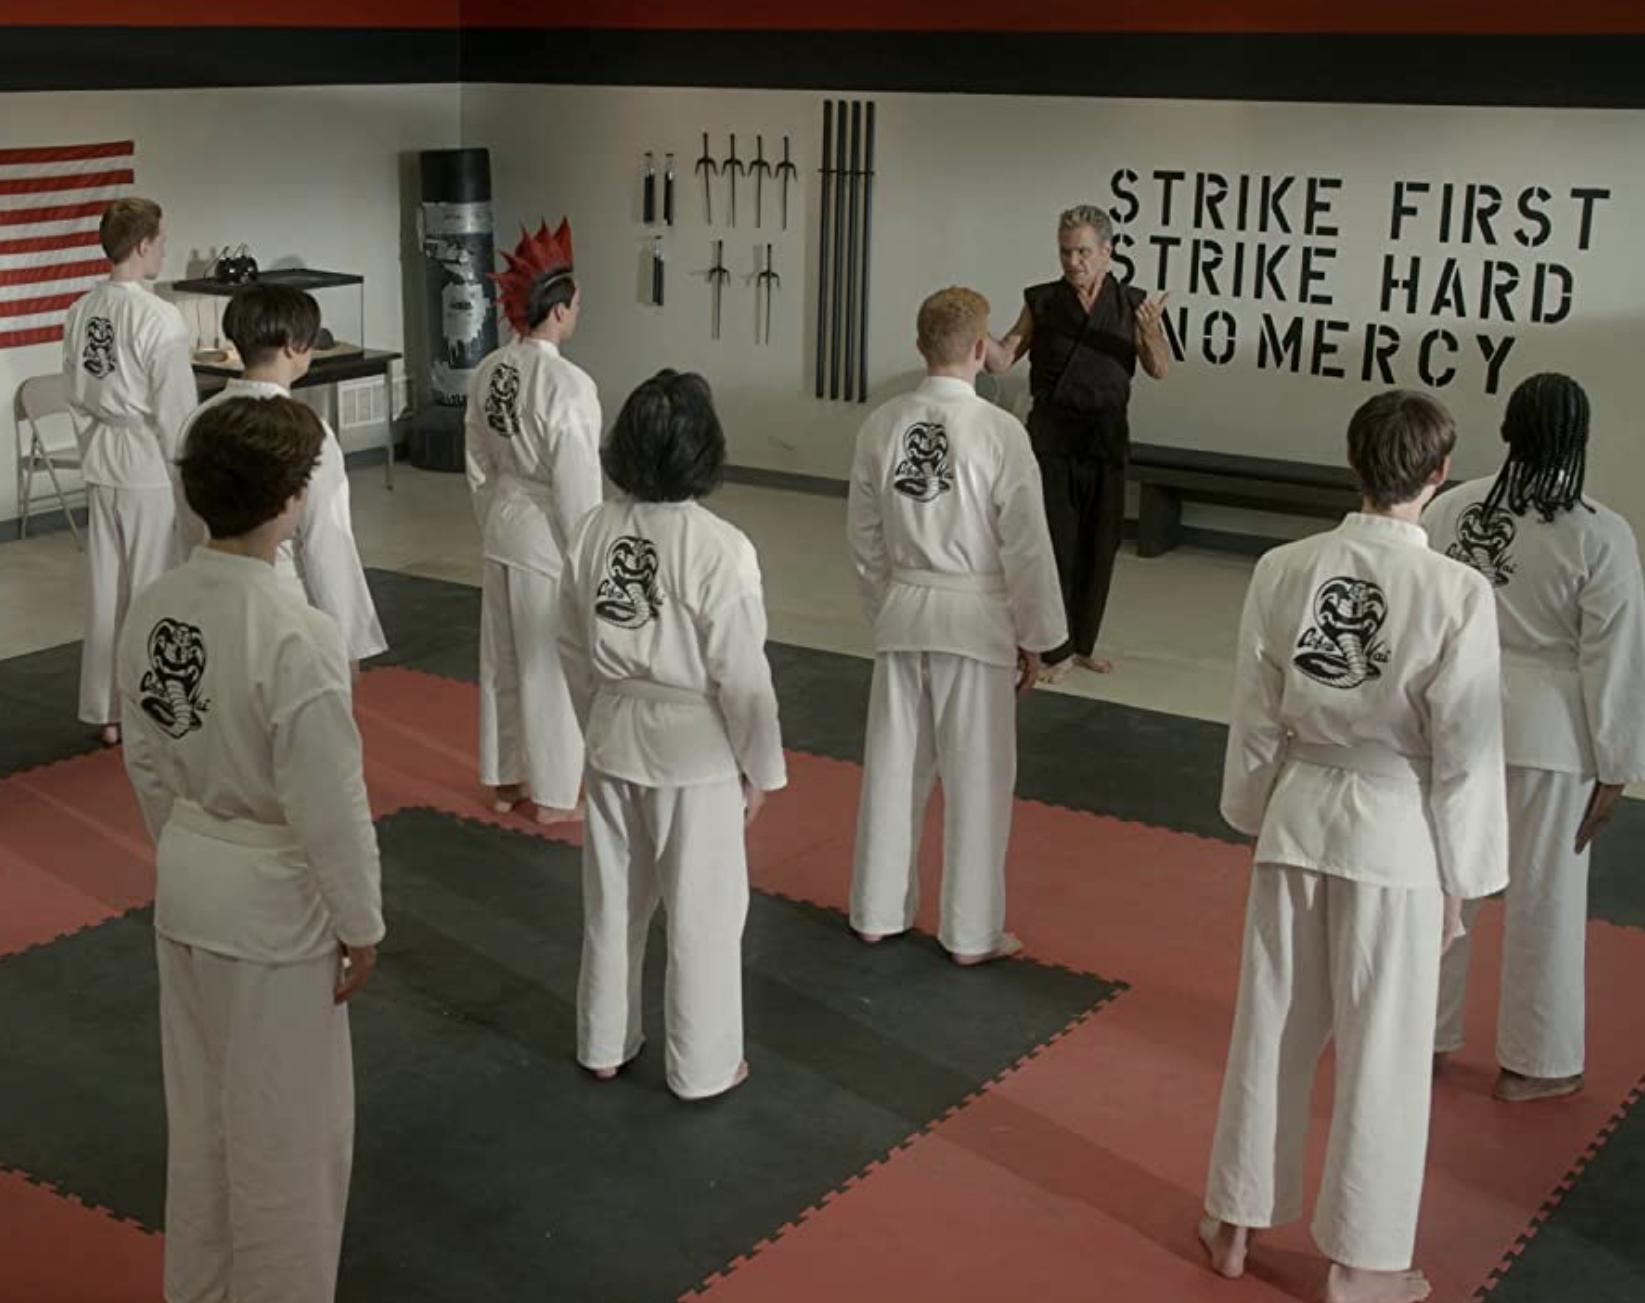 Screenshot 2021 05 05 at 15.12.43 e1620224050265 Cobra Kai Proves Daniel Was The Real Villain Of Karate Kid All Along